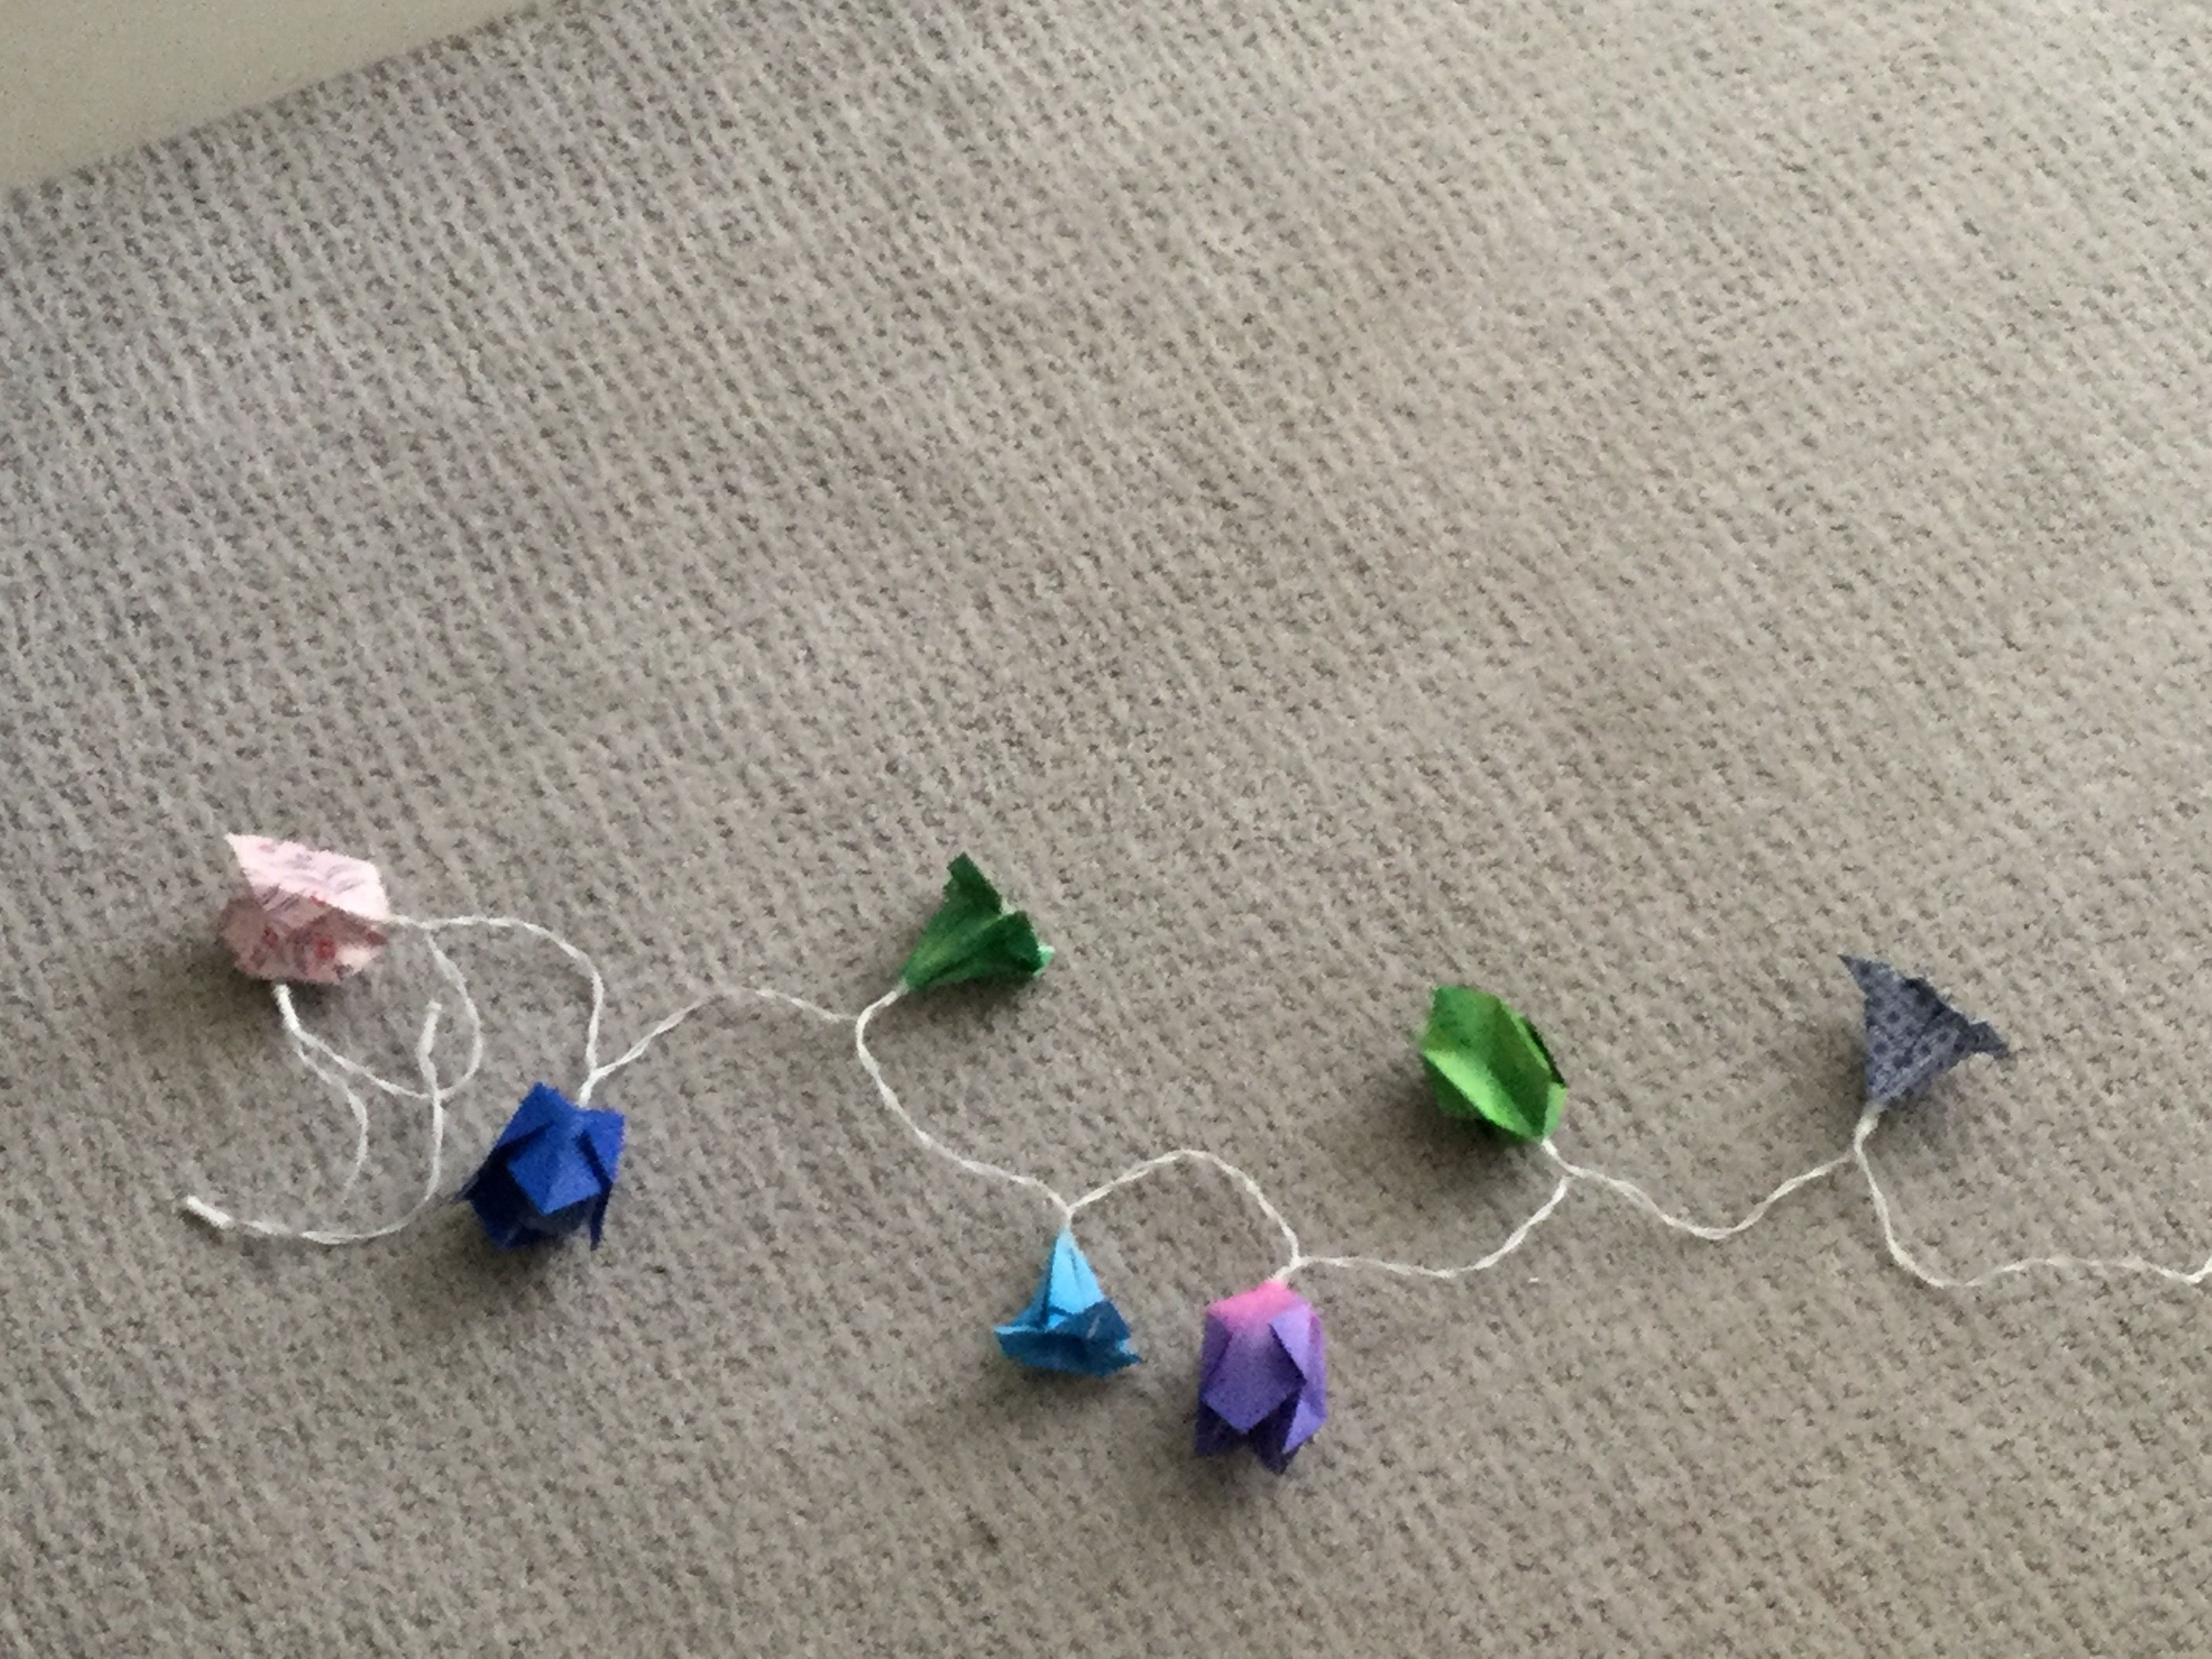 origamiflowers in 2020 Origami flowers, Origami, Jewelry